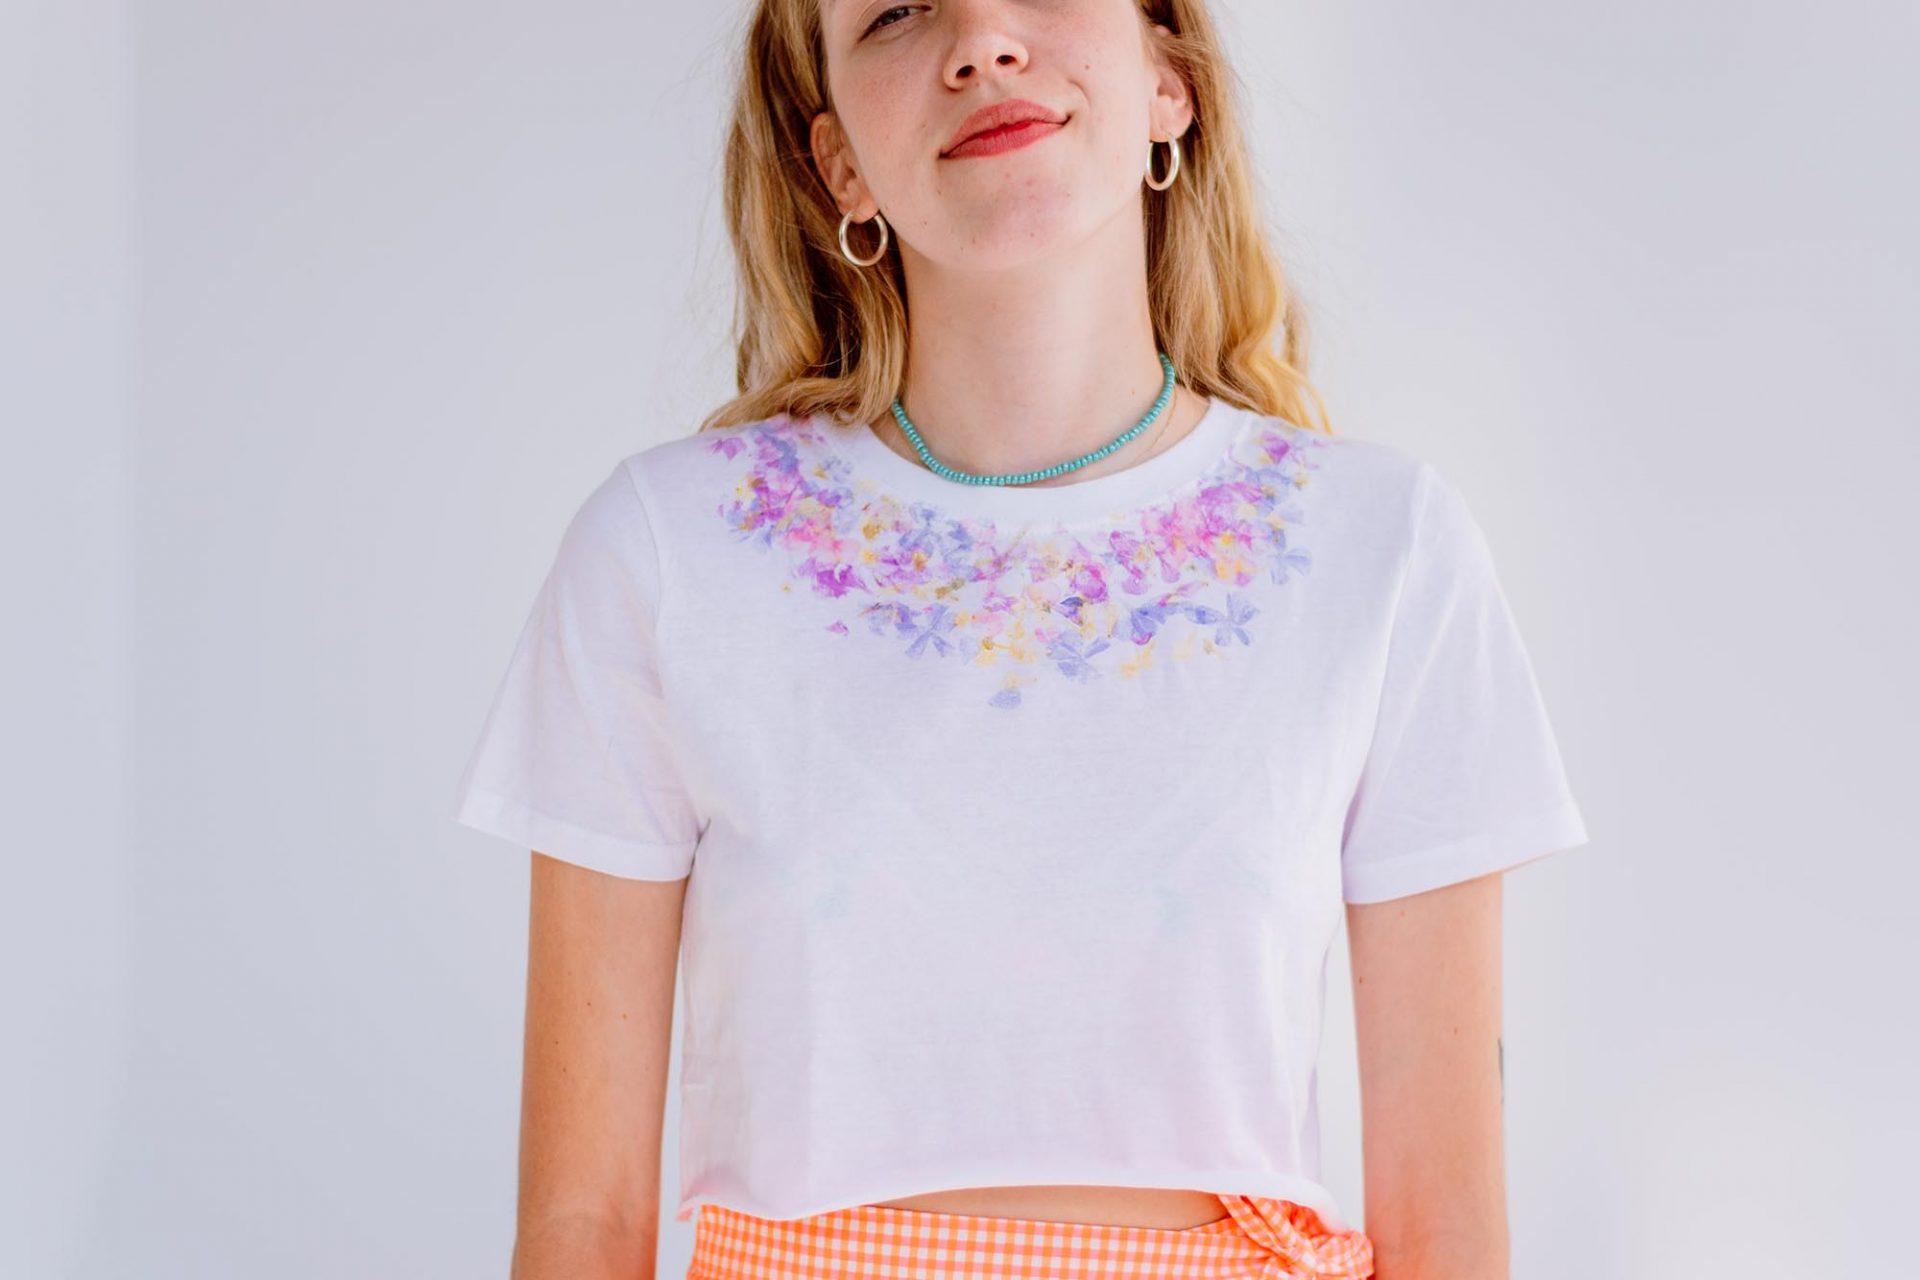 Ashinyday.com-t-shirt τύπωμα